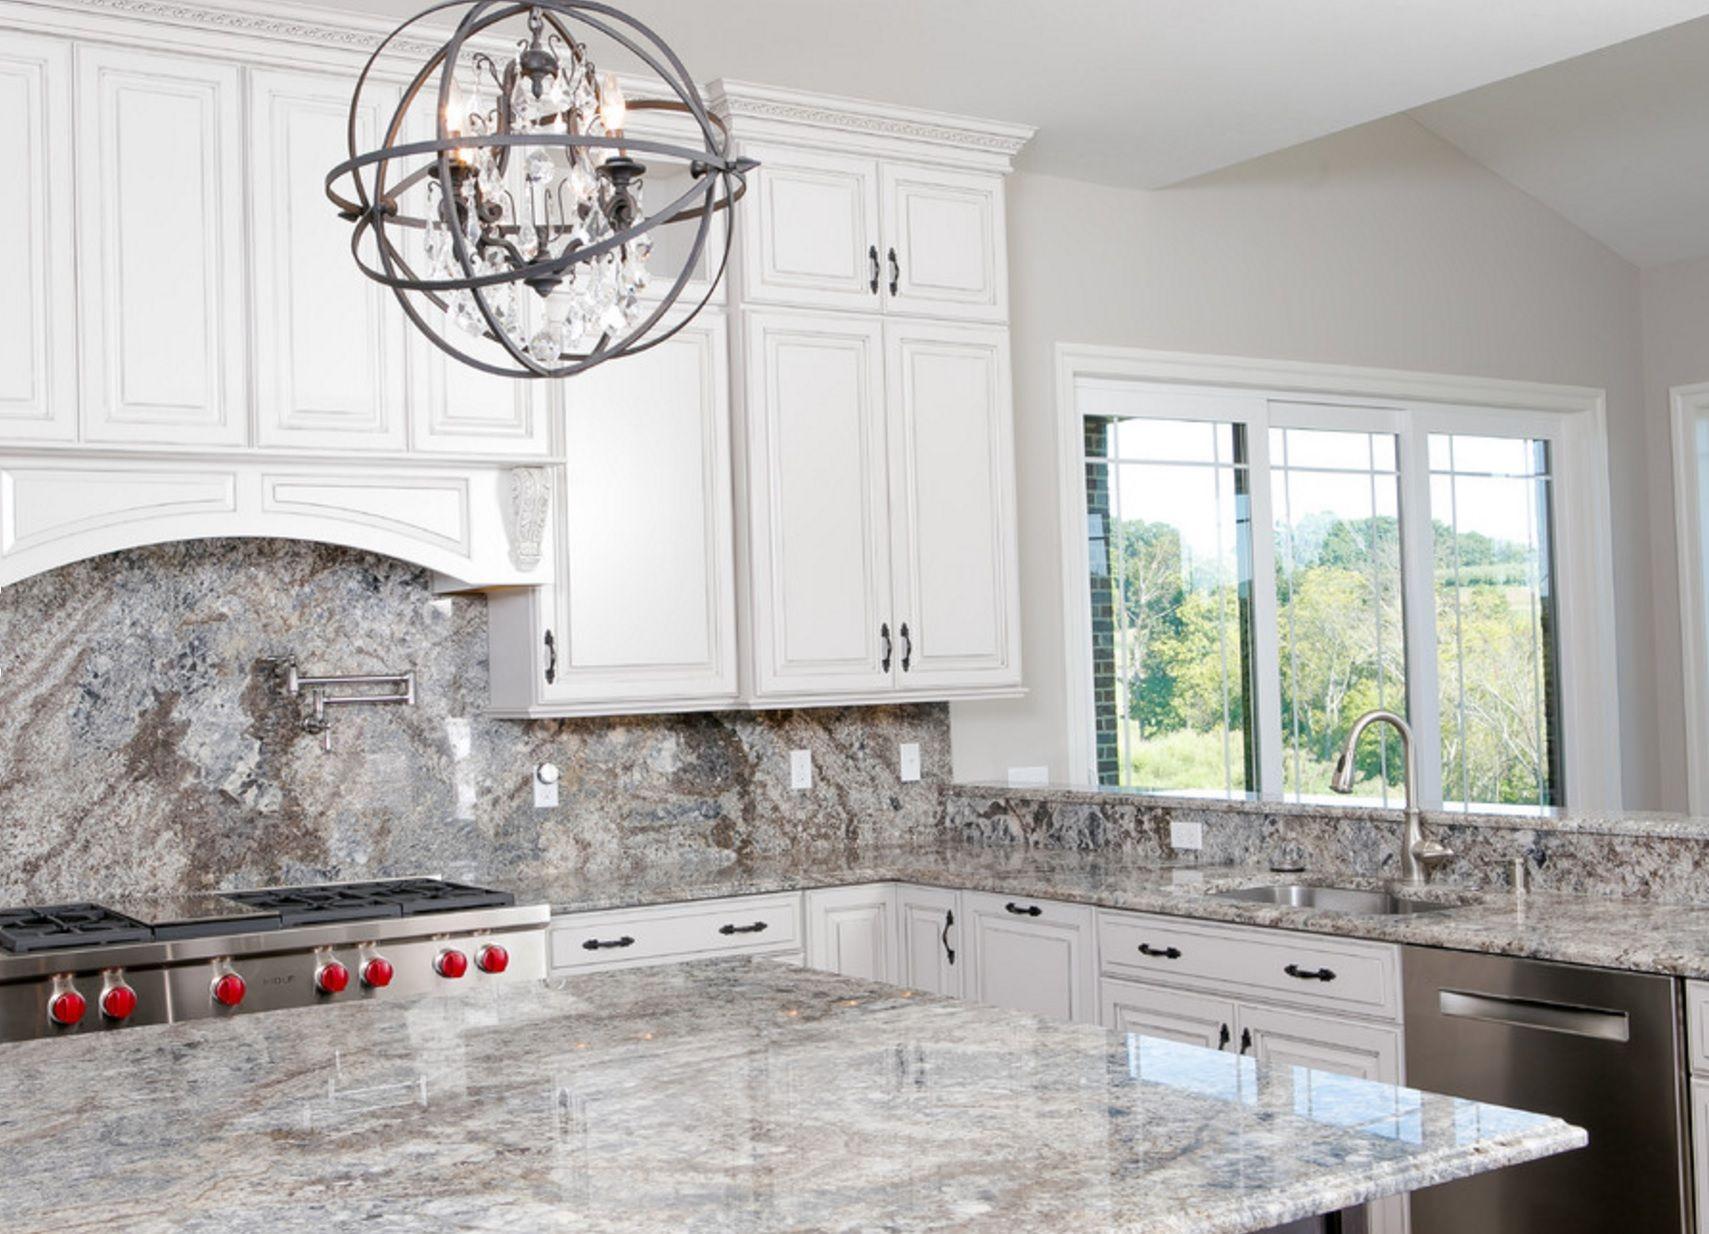 Beautiful Large Kitchen Design Large Kitchen Design Kitchen Kitchen Design